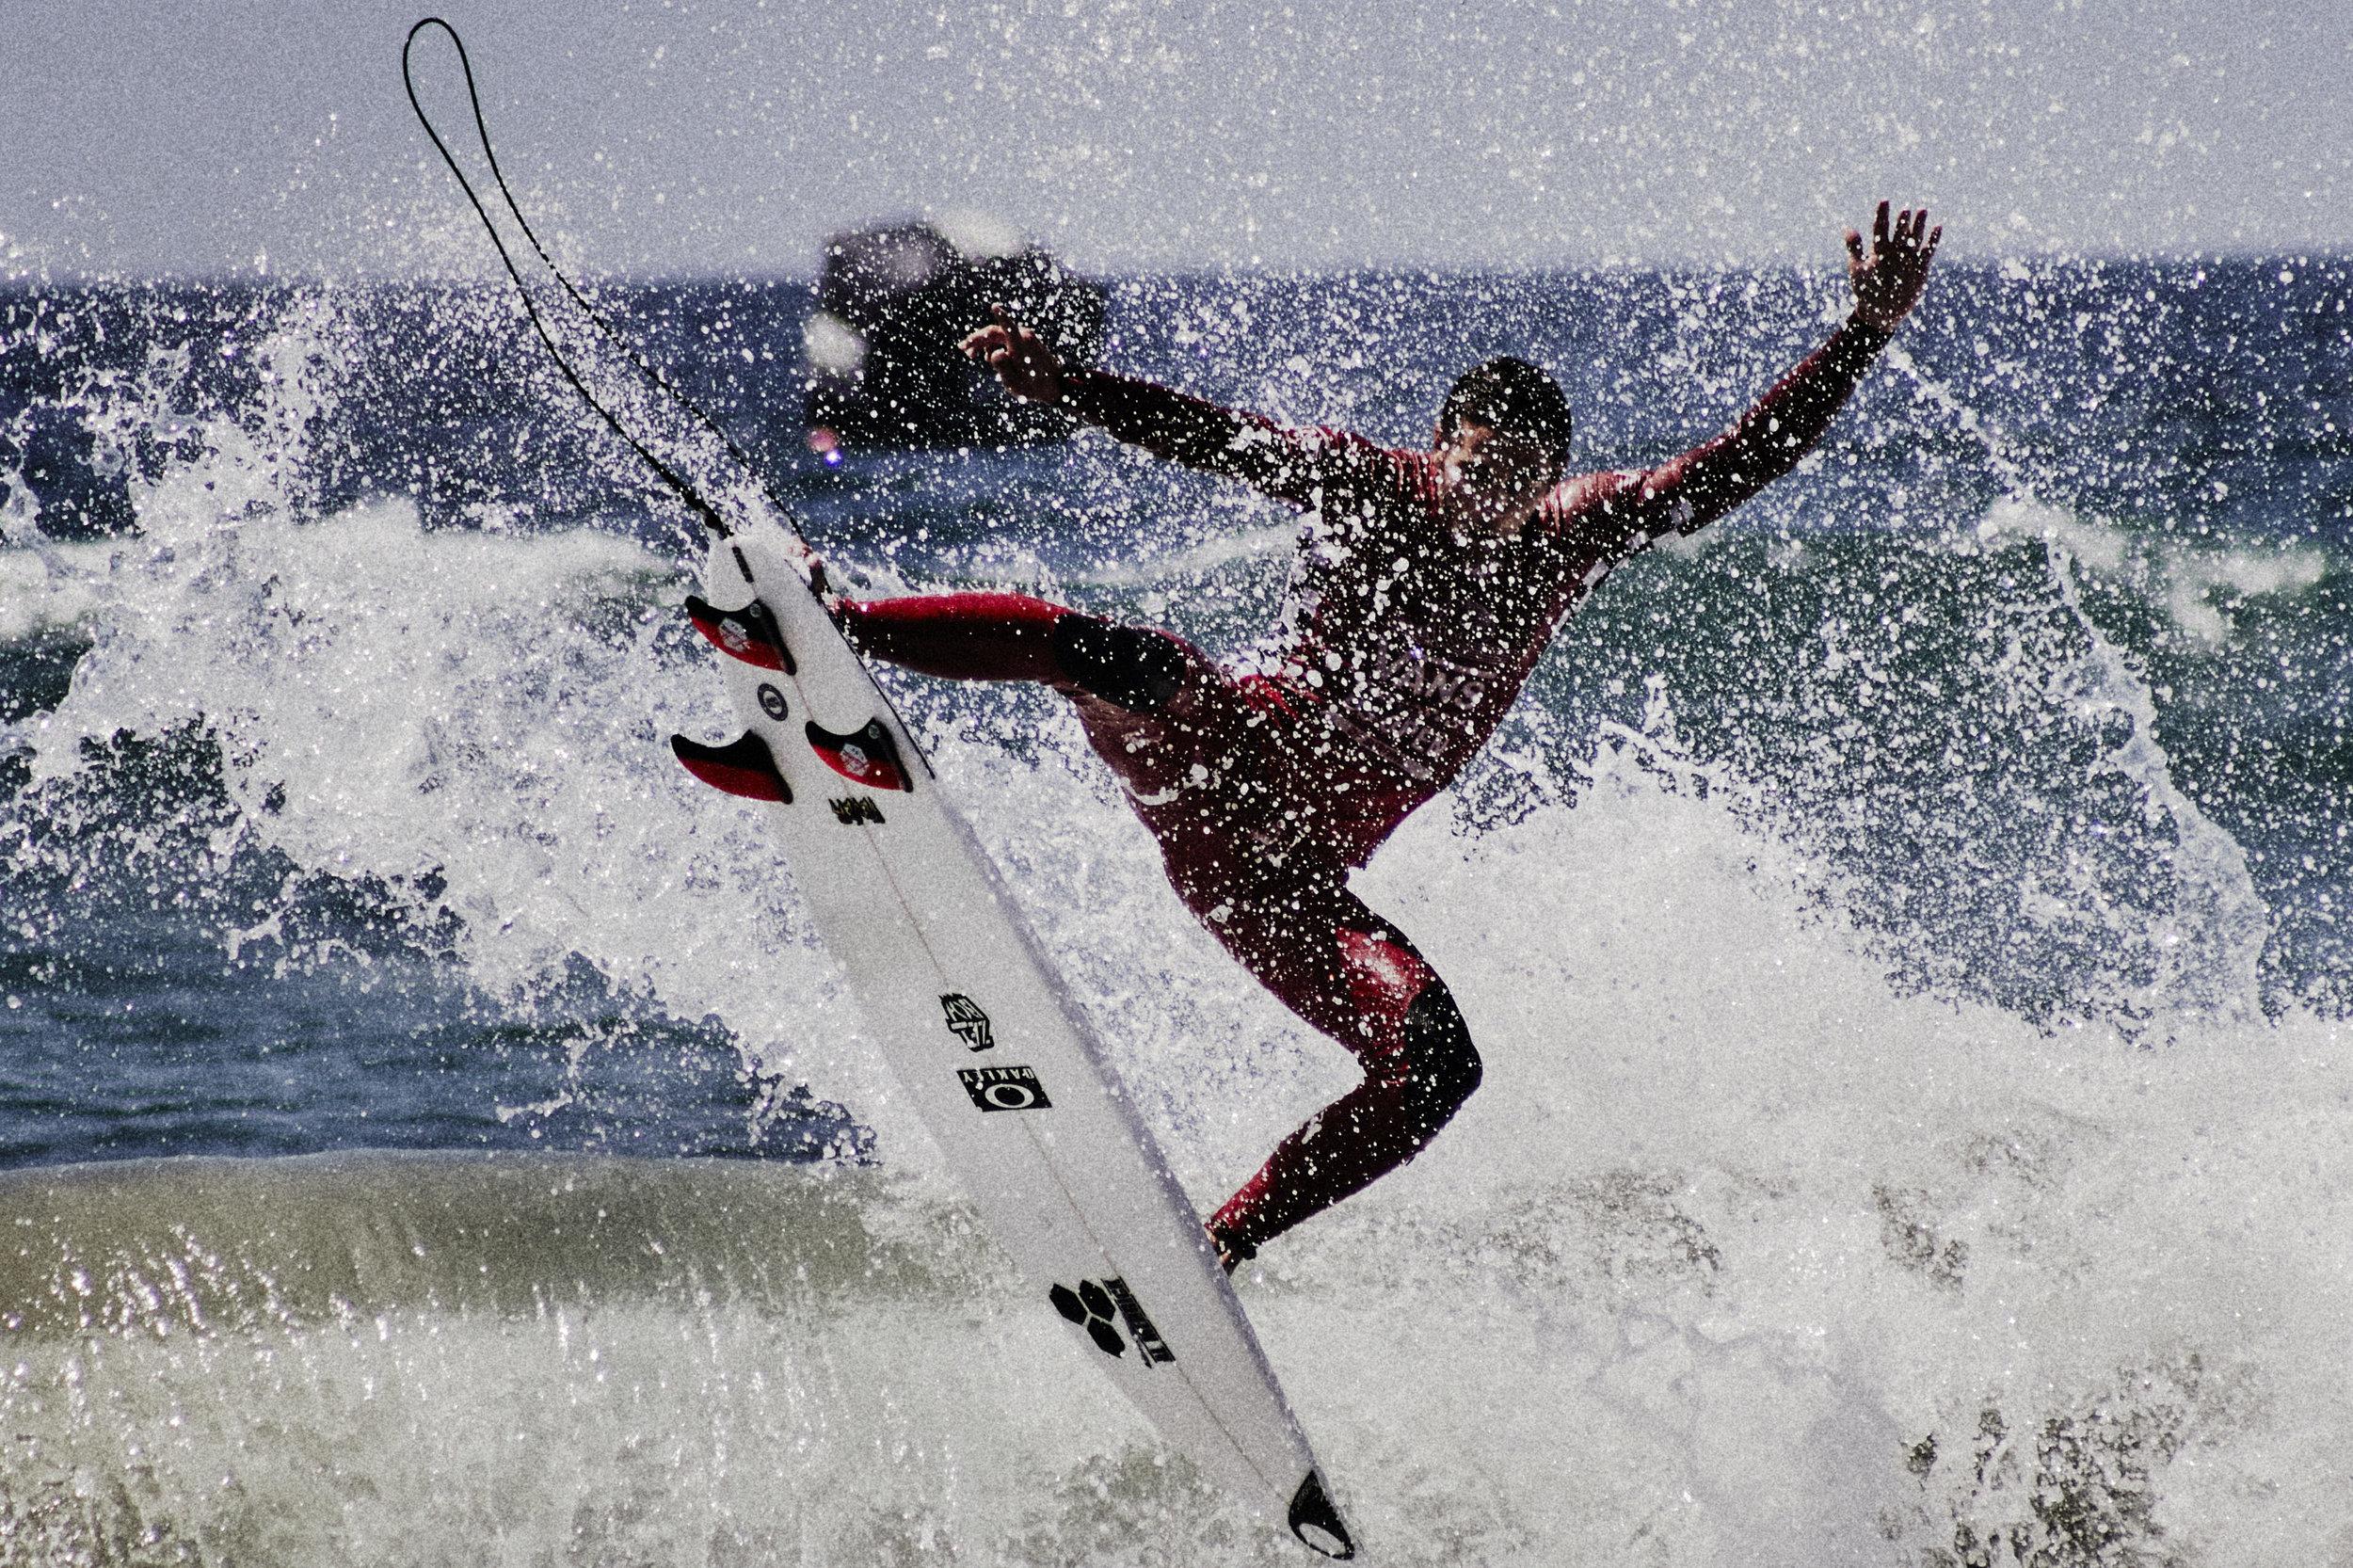 Huntington_Vans_US_Surf_Open_296.jpg